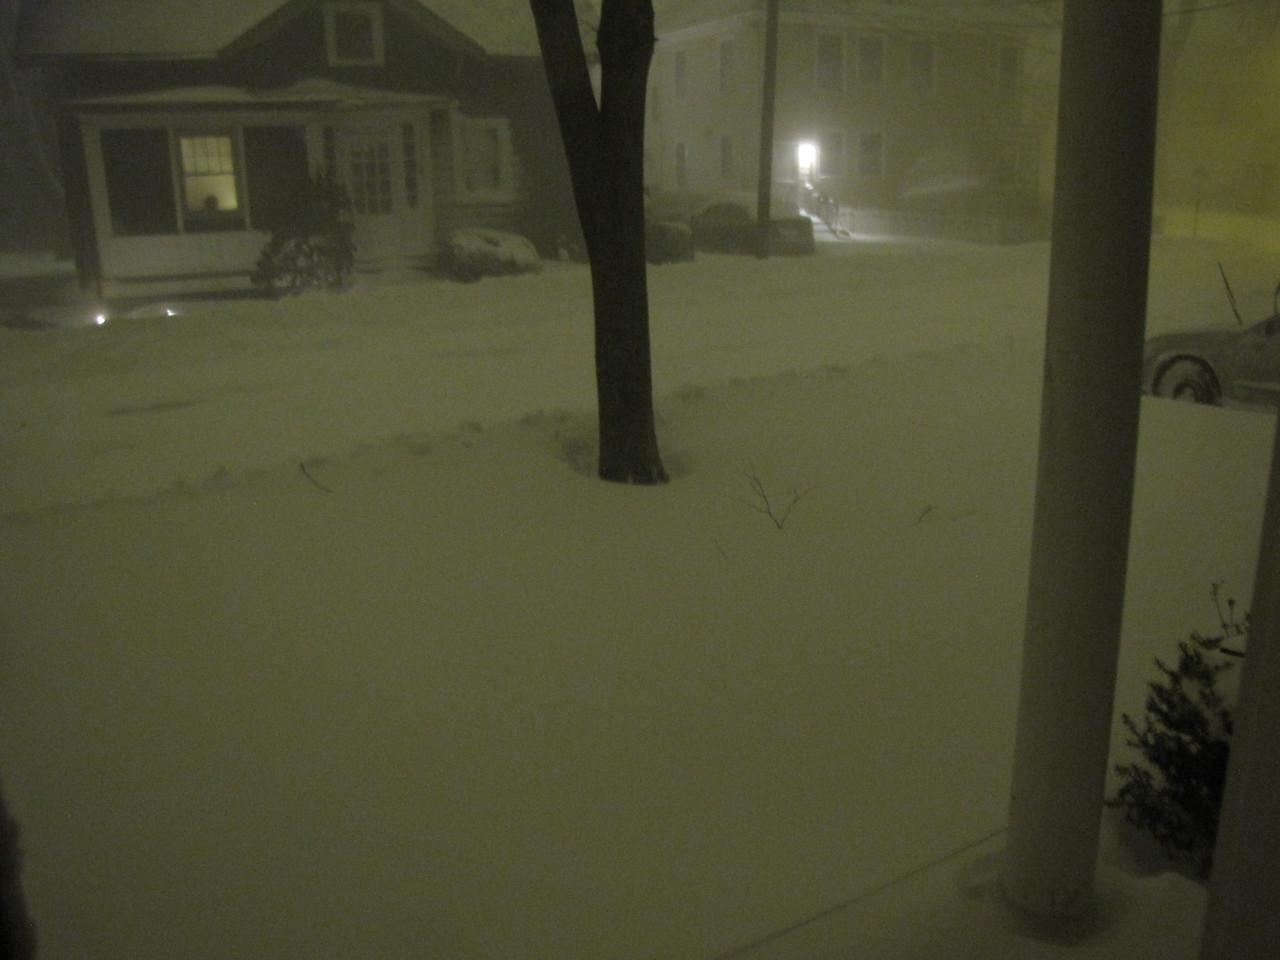 Friday night, around midnight, front door